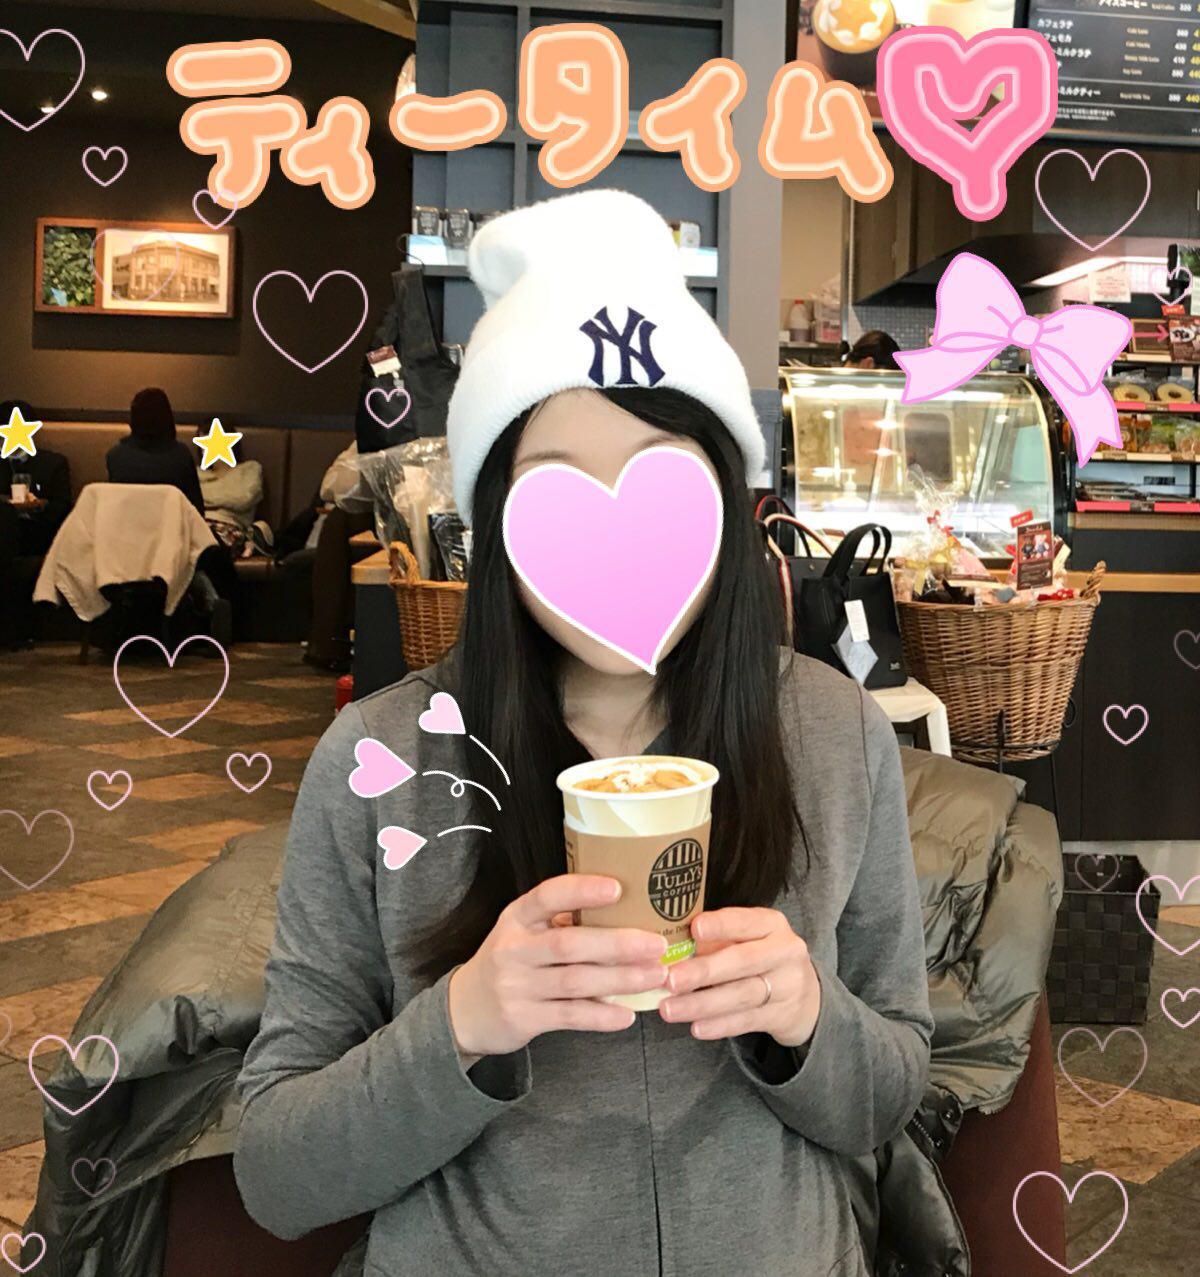 photo_2018-02-11_23-45-32.jpg